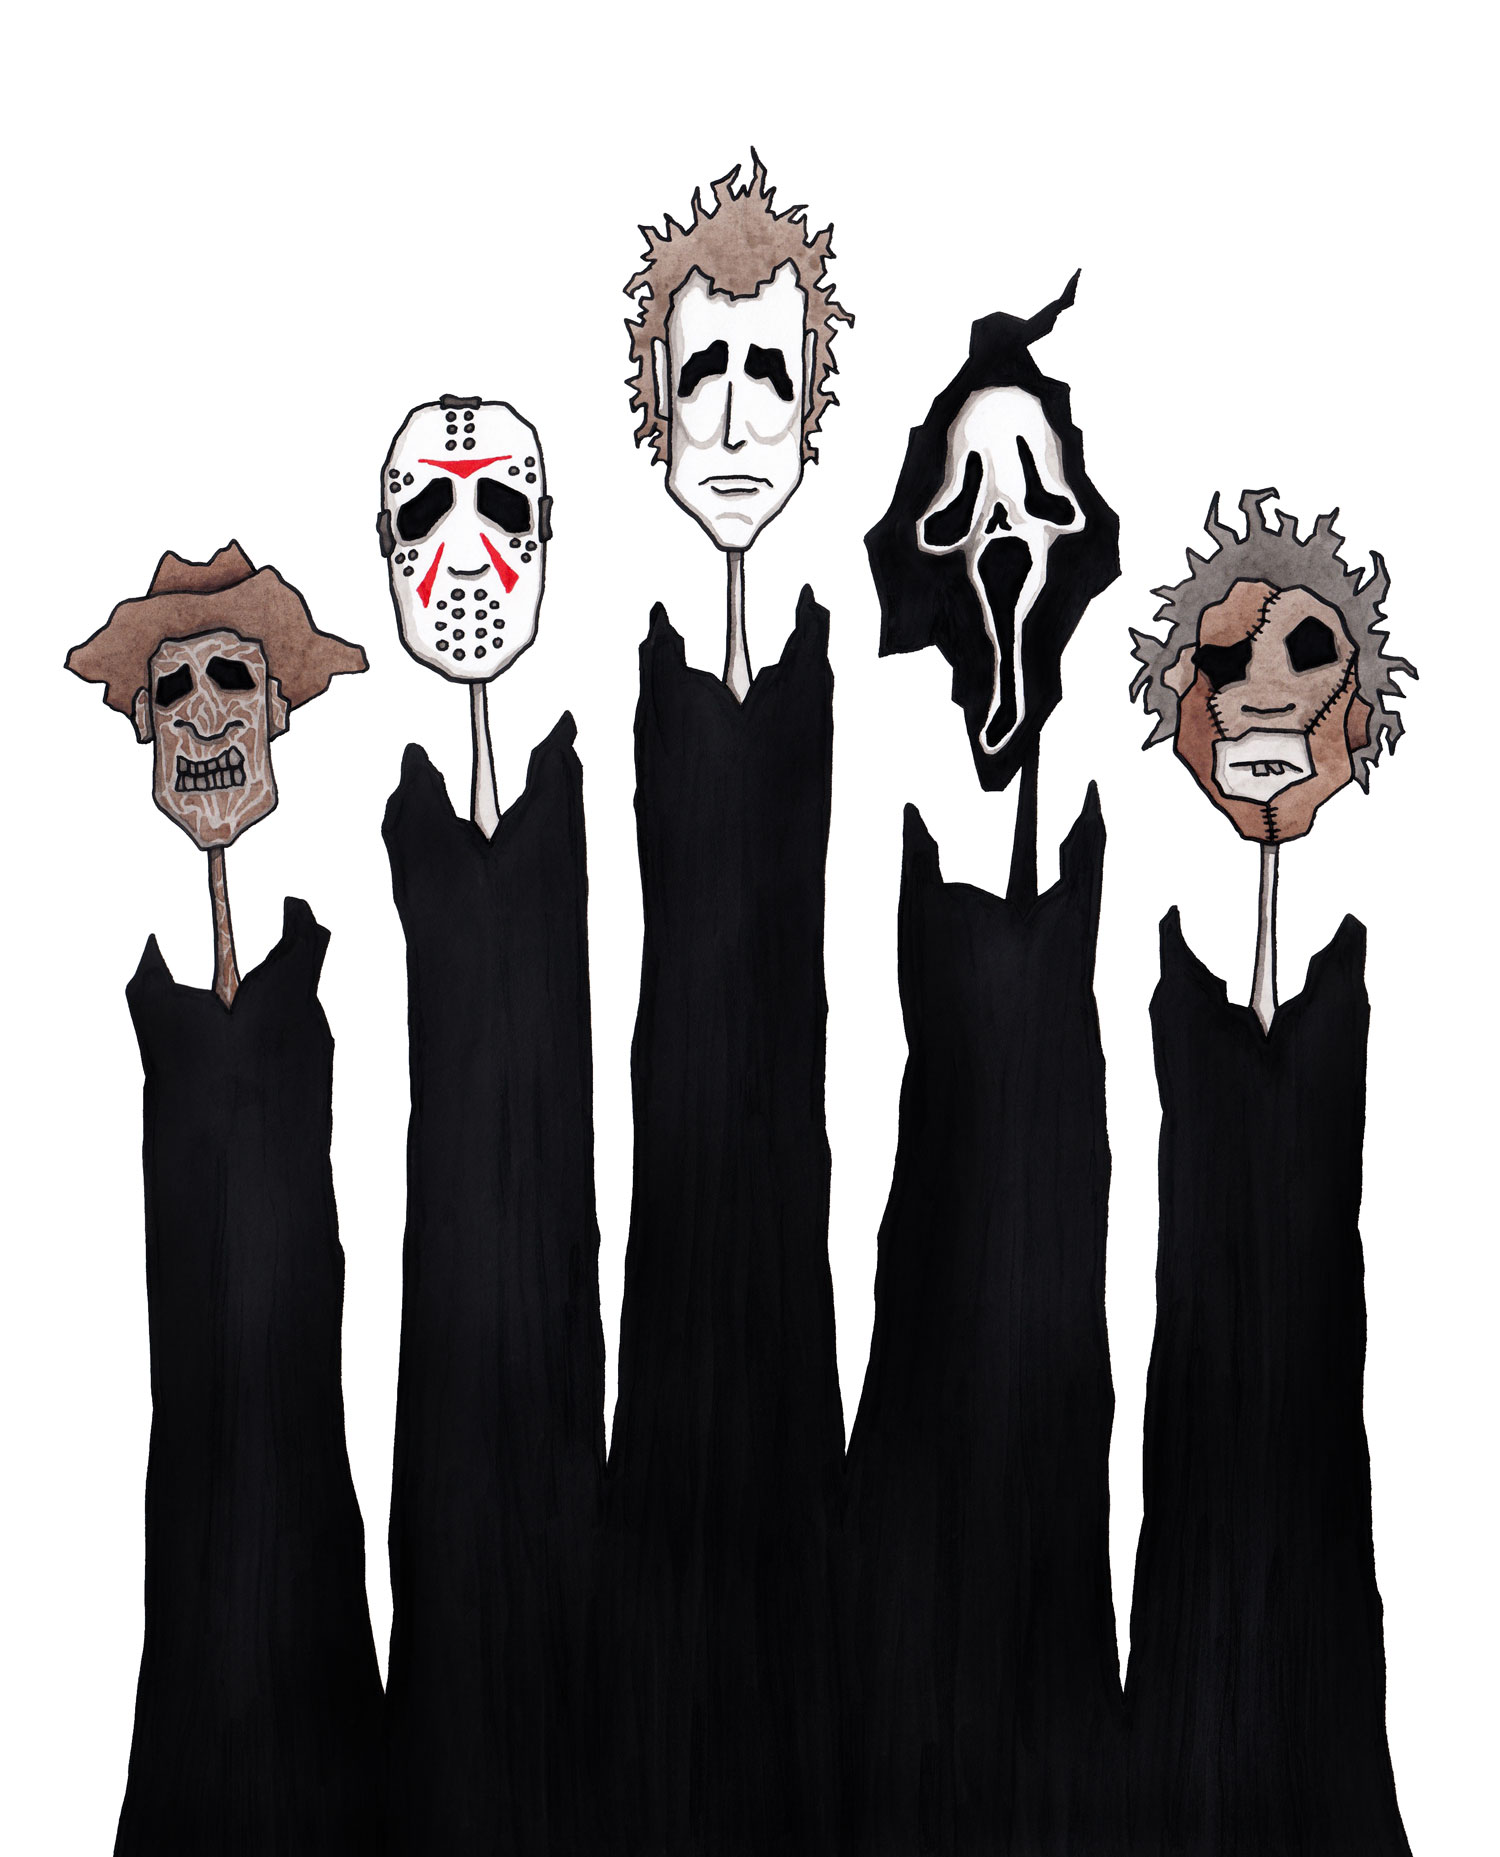 horror-freddy-kruger-michael-myers-jason-voorhees-ghostface-leatherface-illustration-matthew-woods.jpg